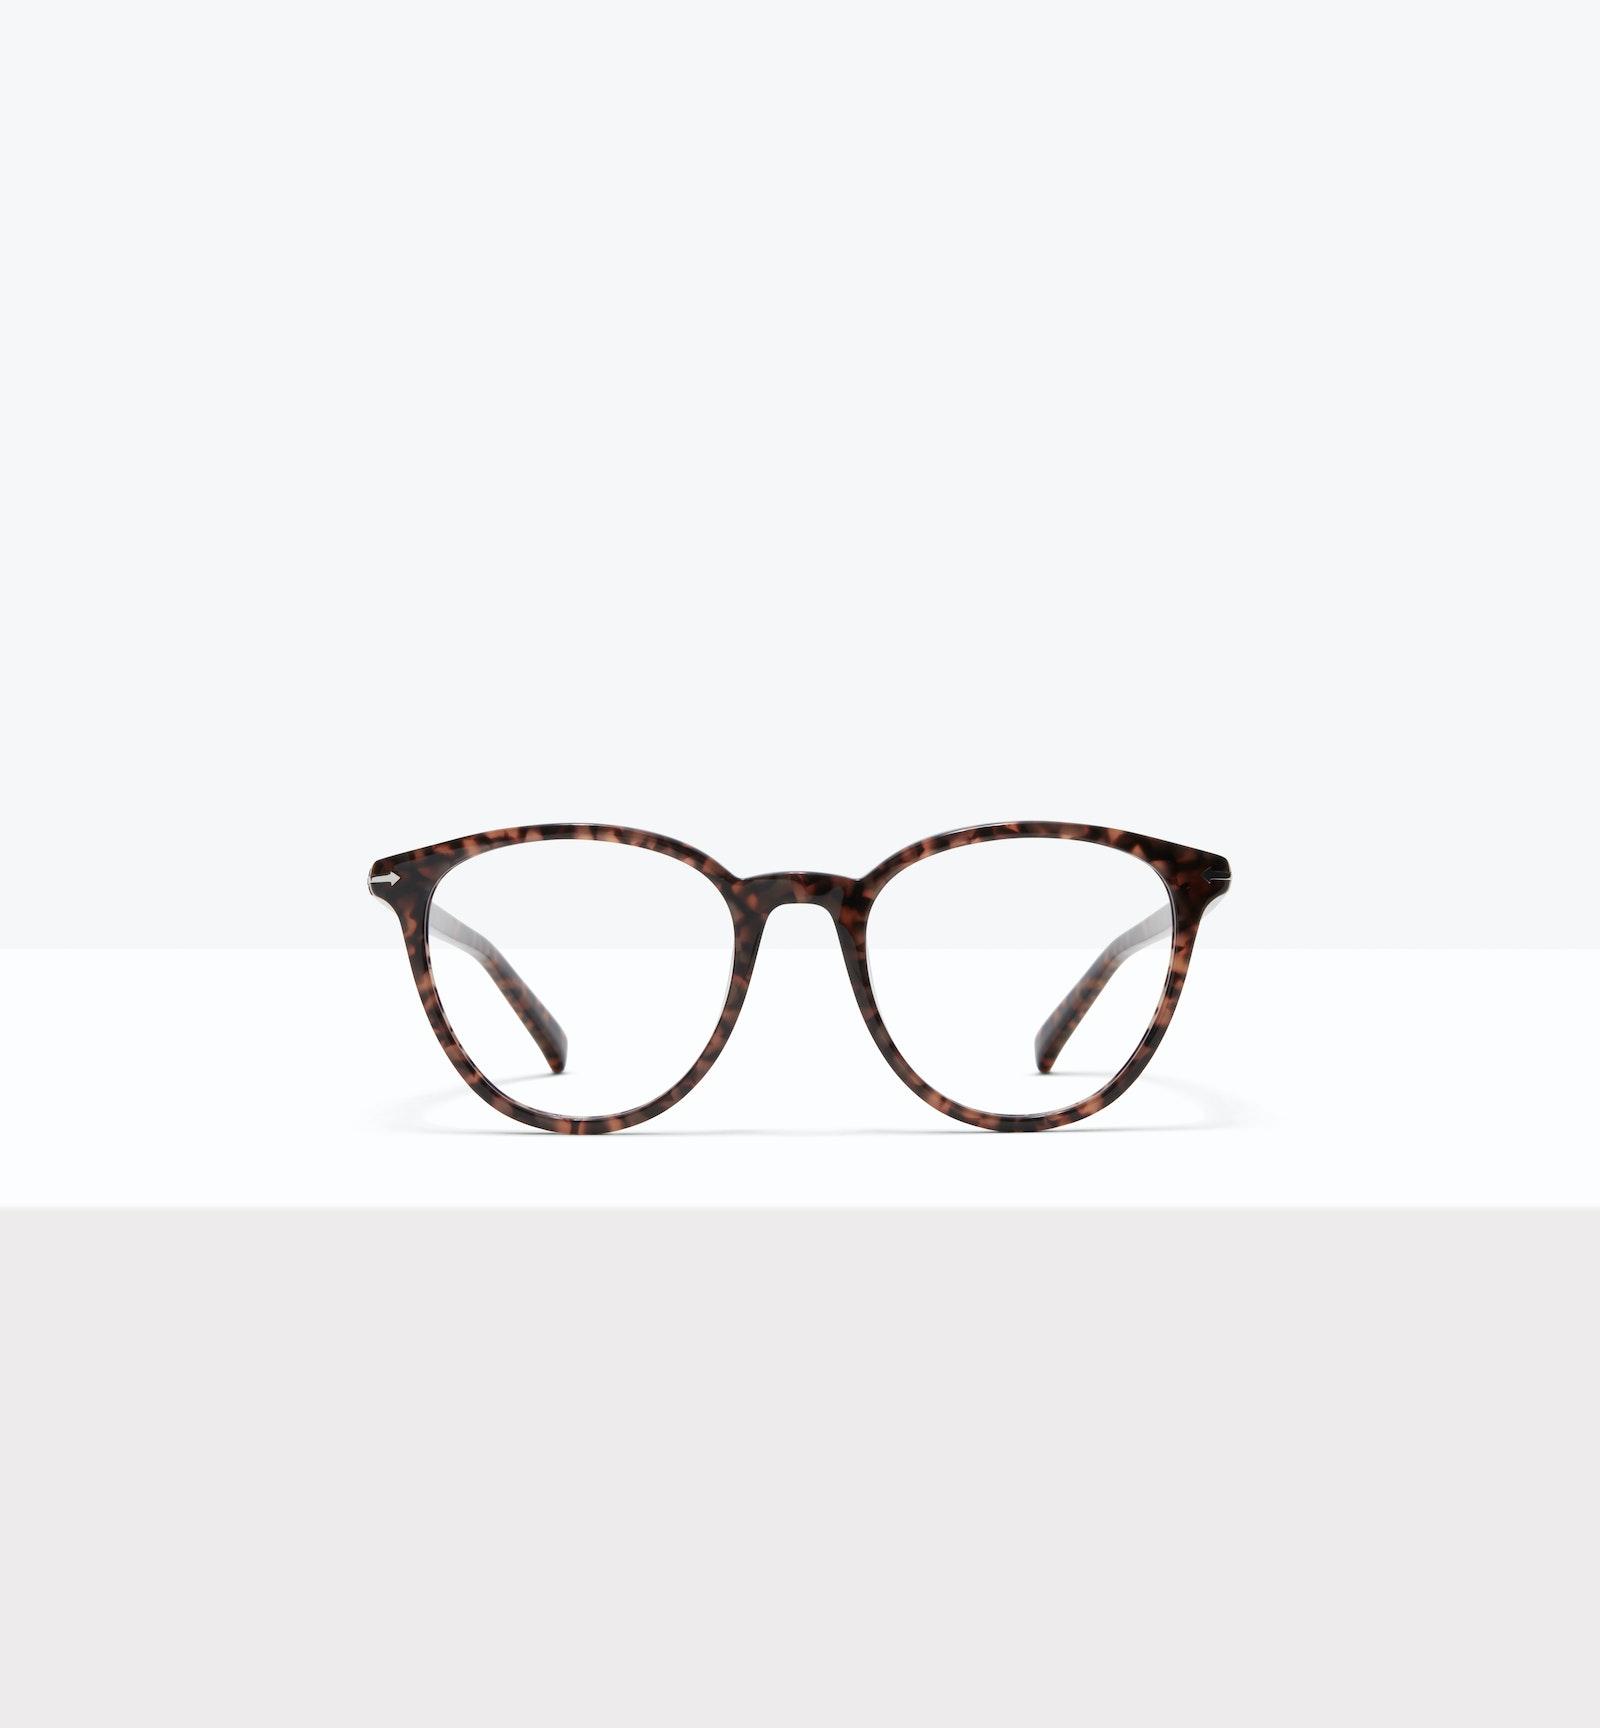 Affordable Fashion Glasses Round Eyeglasses Women London M Leo